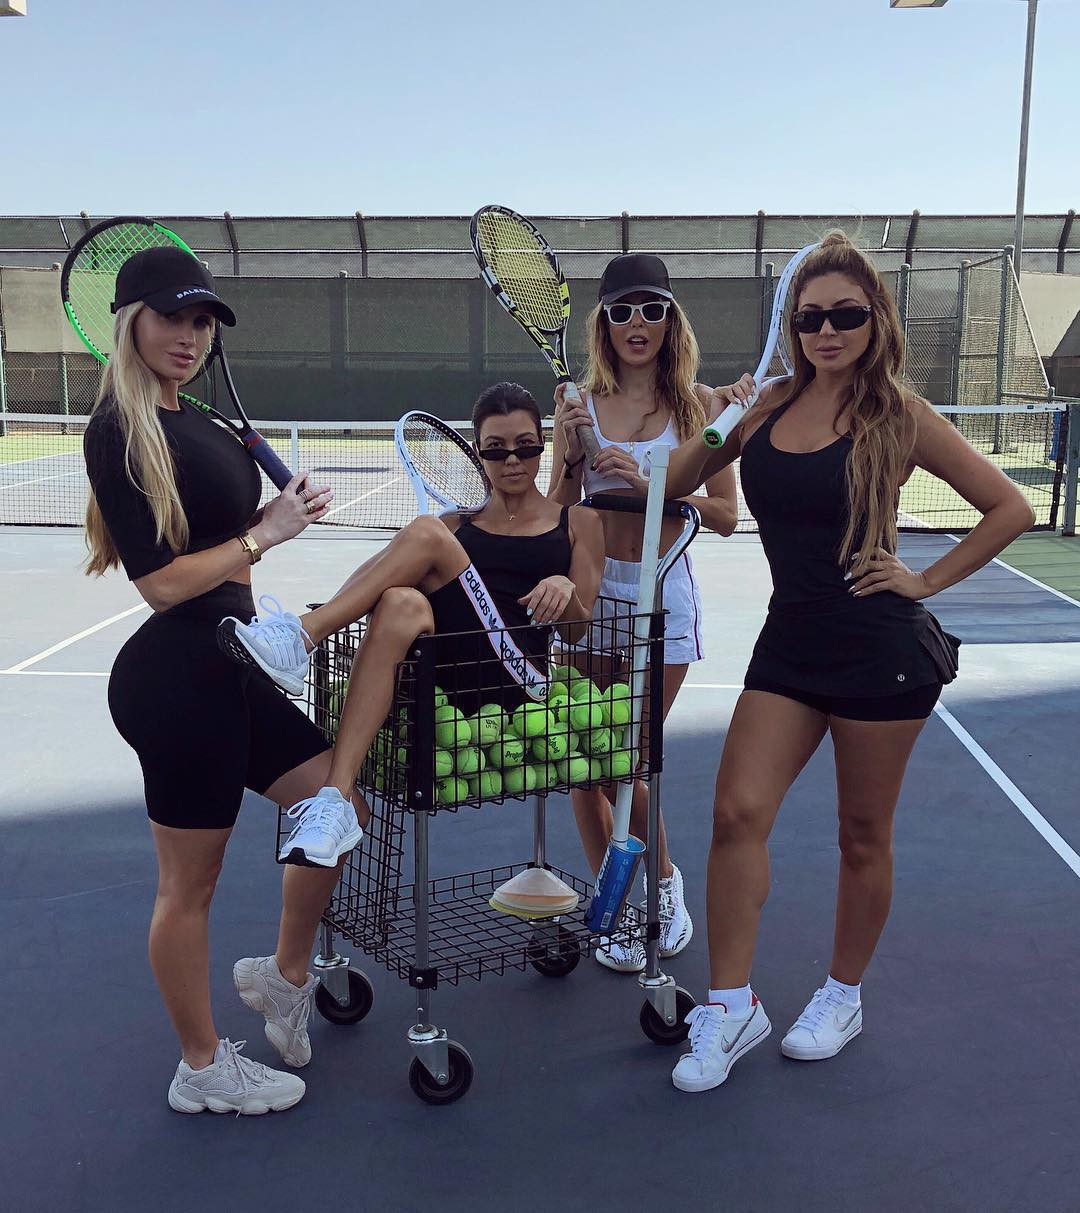 Amanda Lee Hot Photos, Kourtney Kardashian, Tennis shots